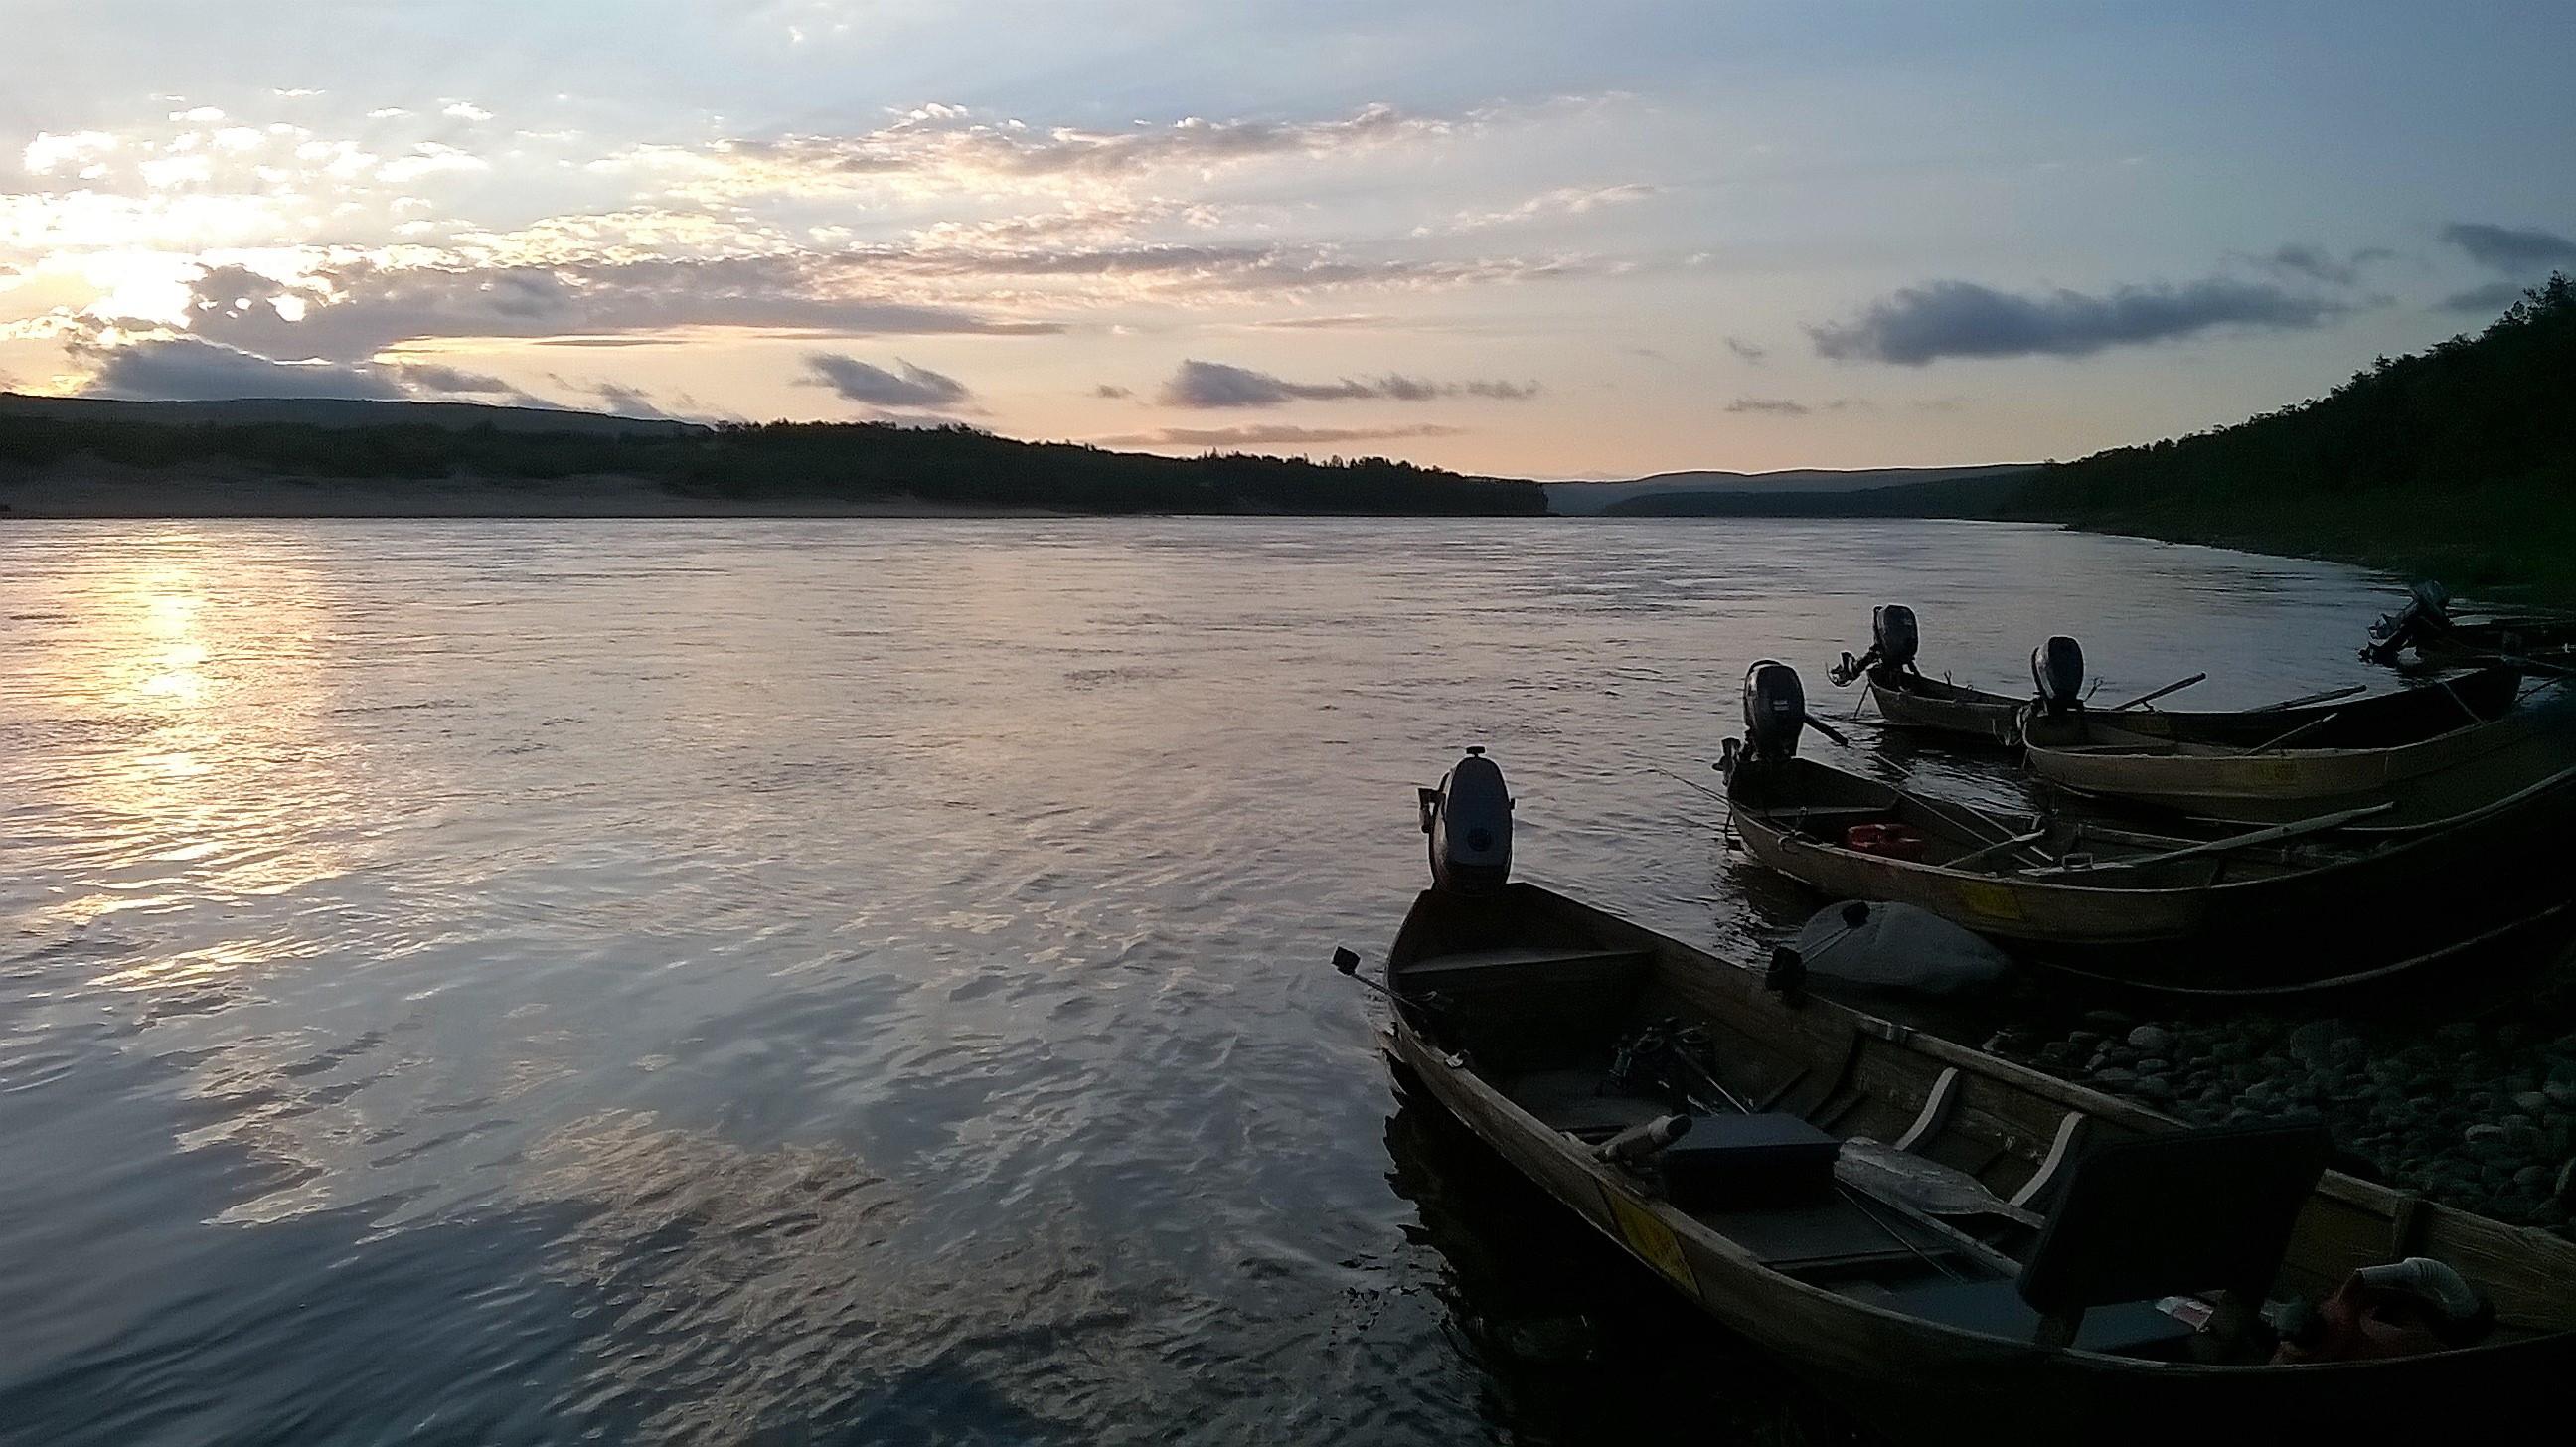 Deatnu River/Tana River (Ilkka Jukarainen / CC via High North News)